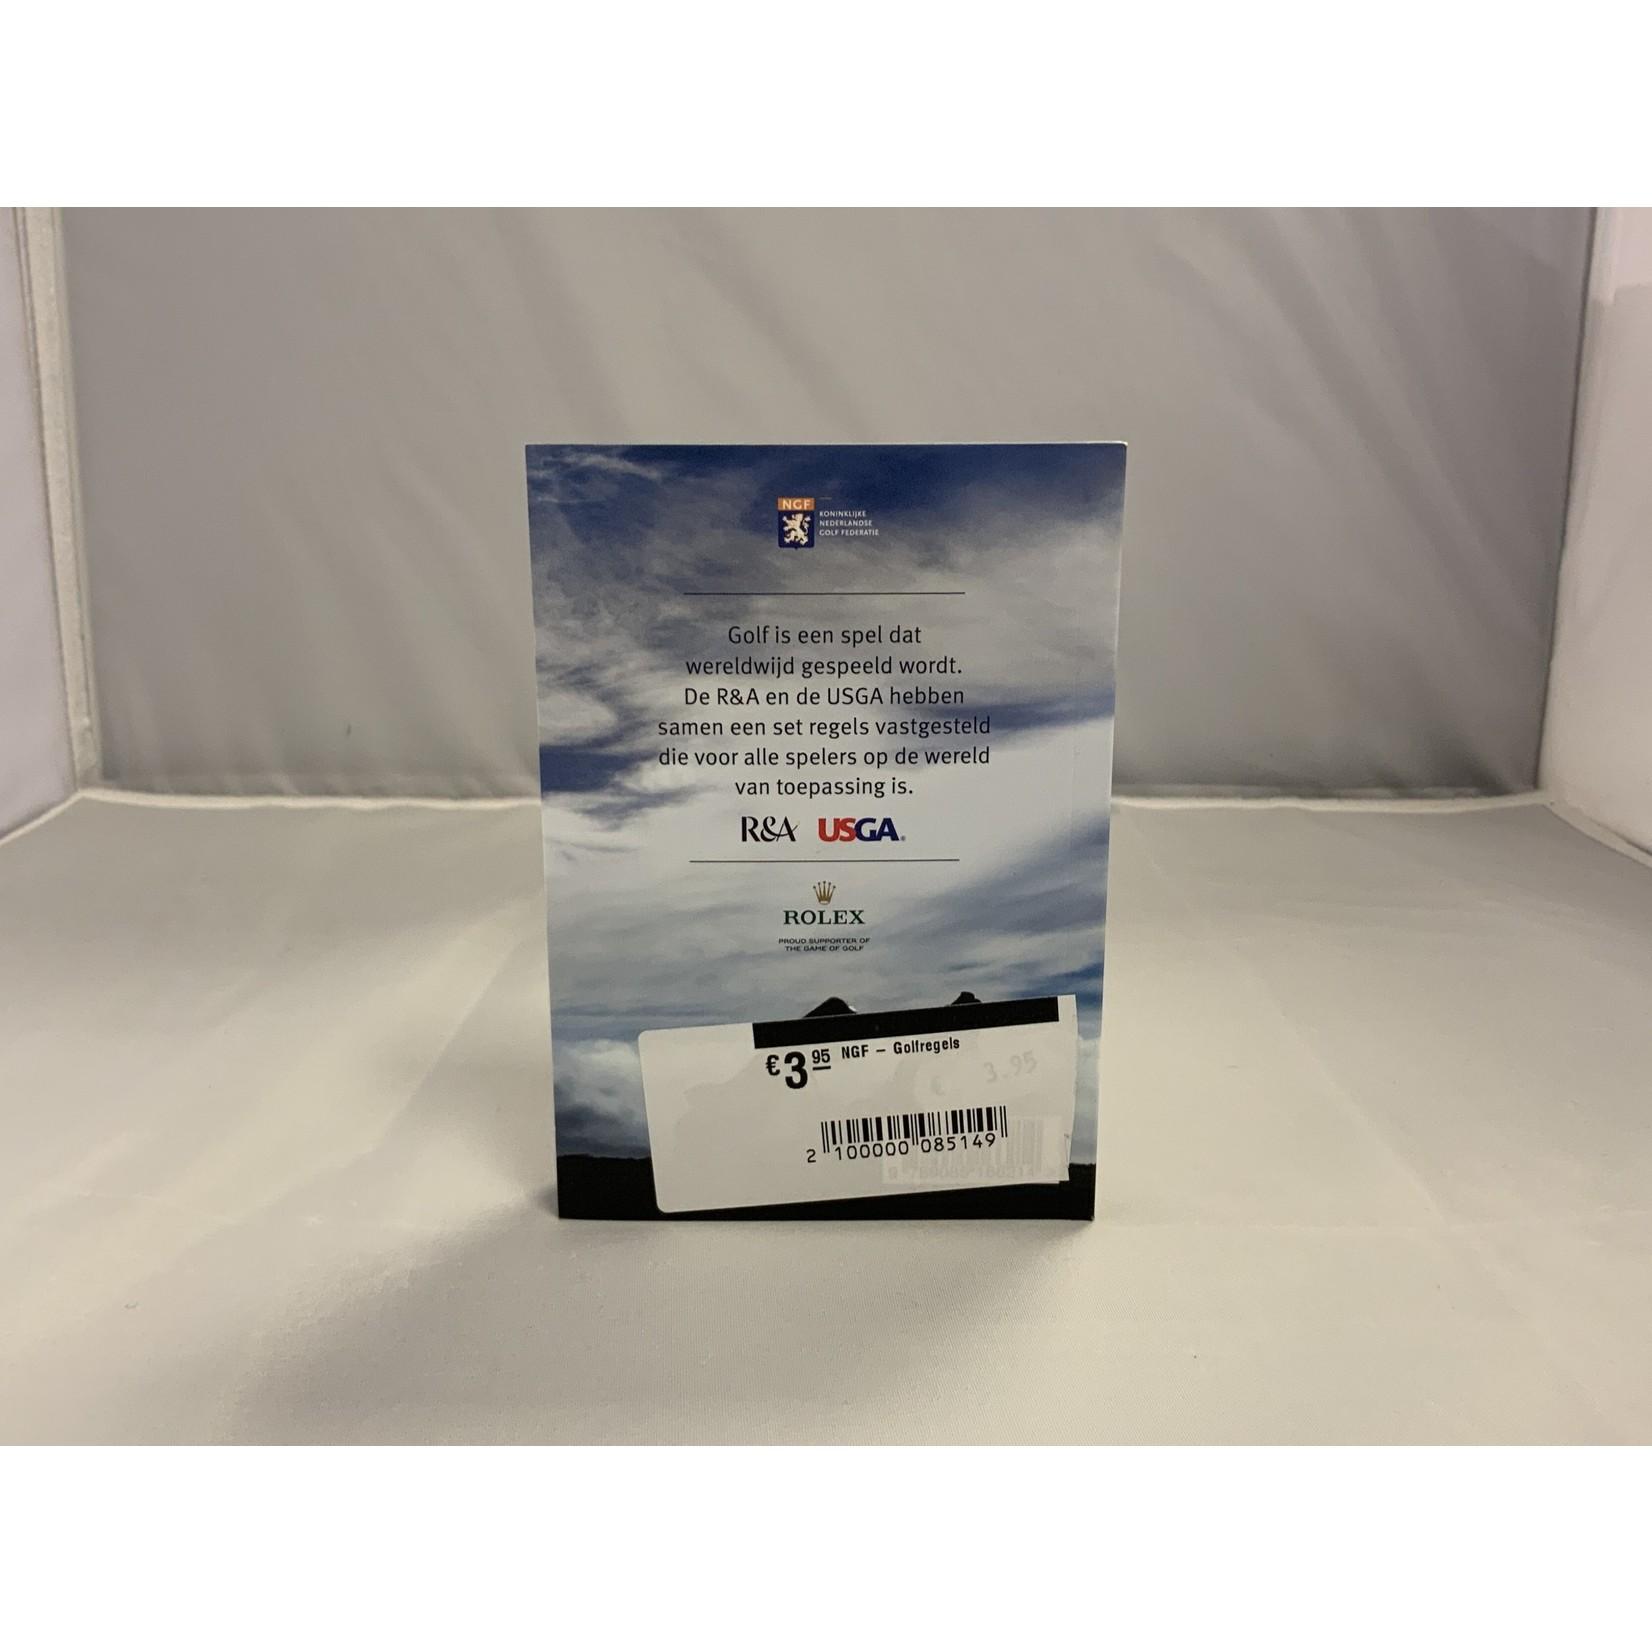 NGF boeken NGF - Golfregels